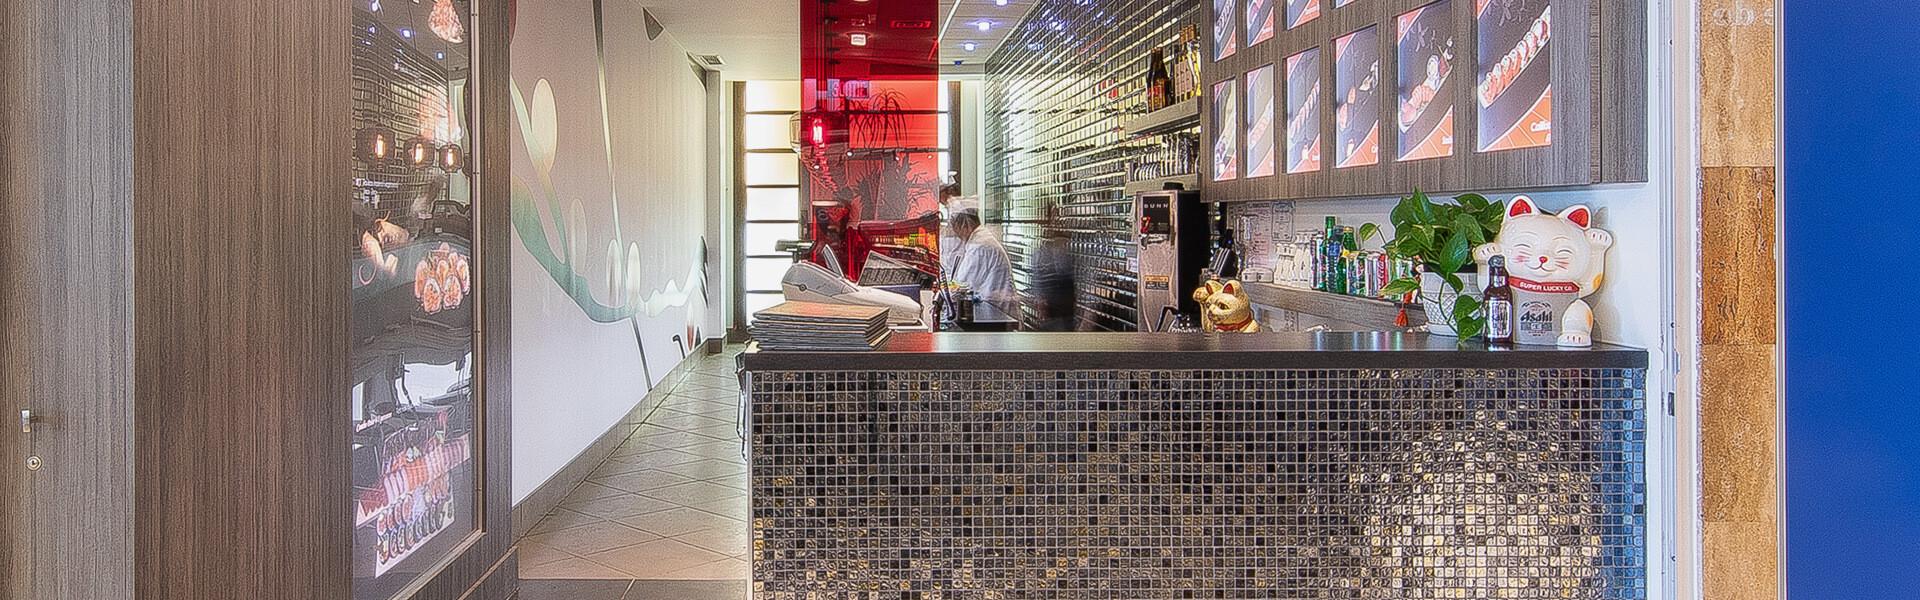 Okane Sushi Bar - RocklandOkane Sushi Bar - Rockland